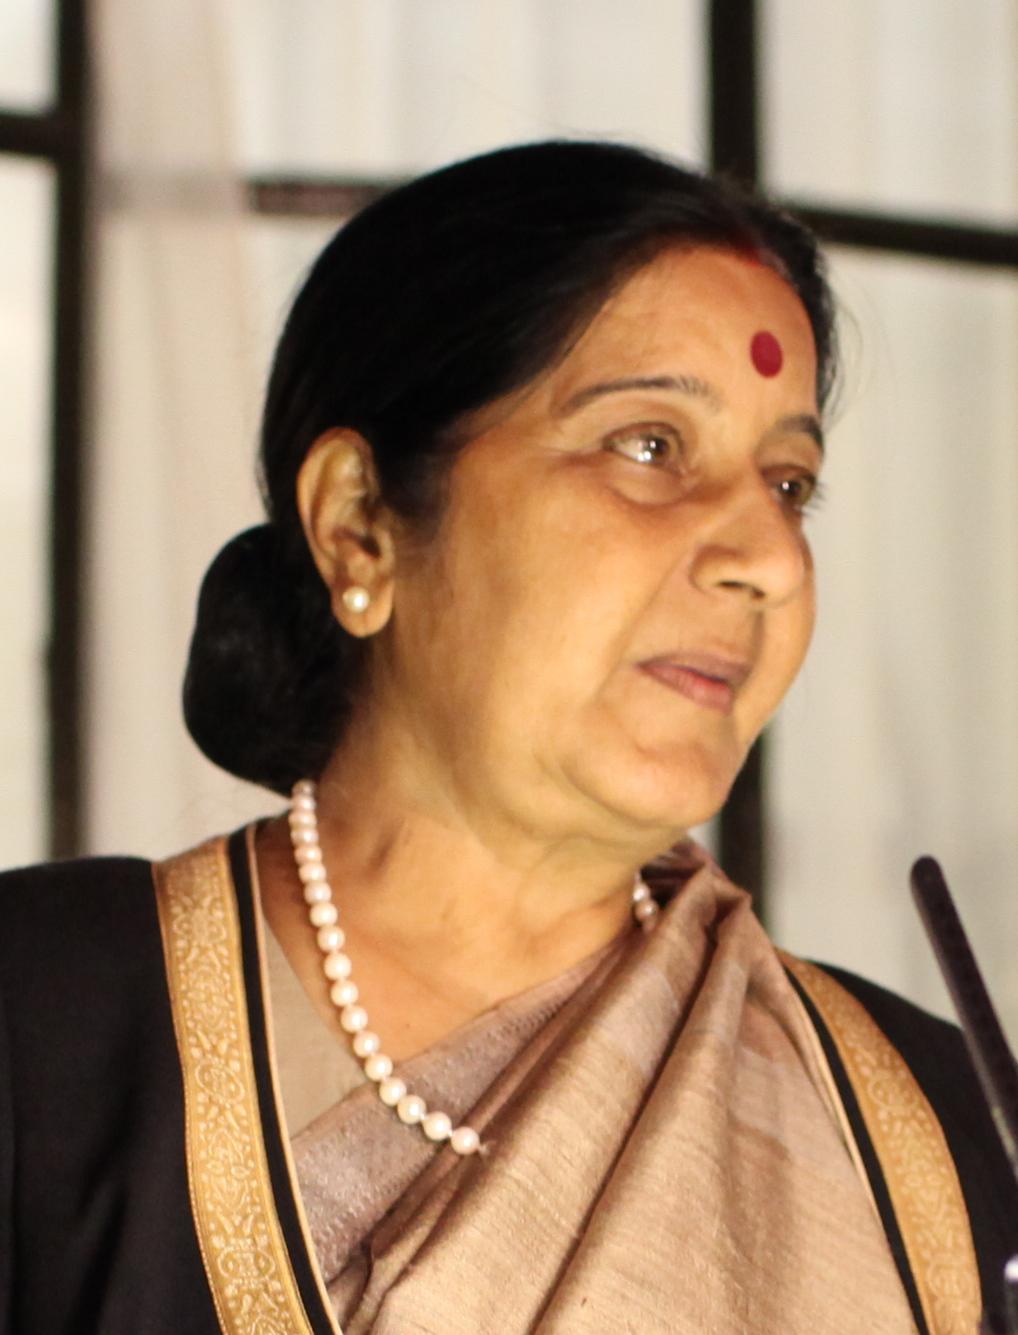 Sushma-Swaraj-former-external-affair-minister-government-of-india-entertainments-saga